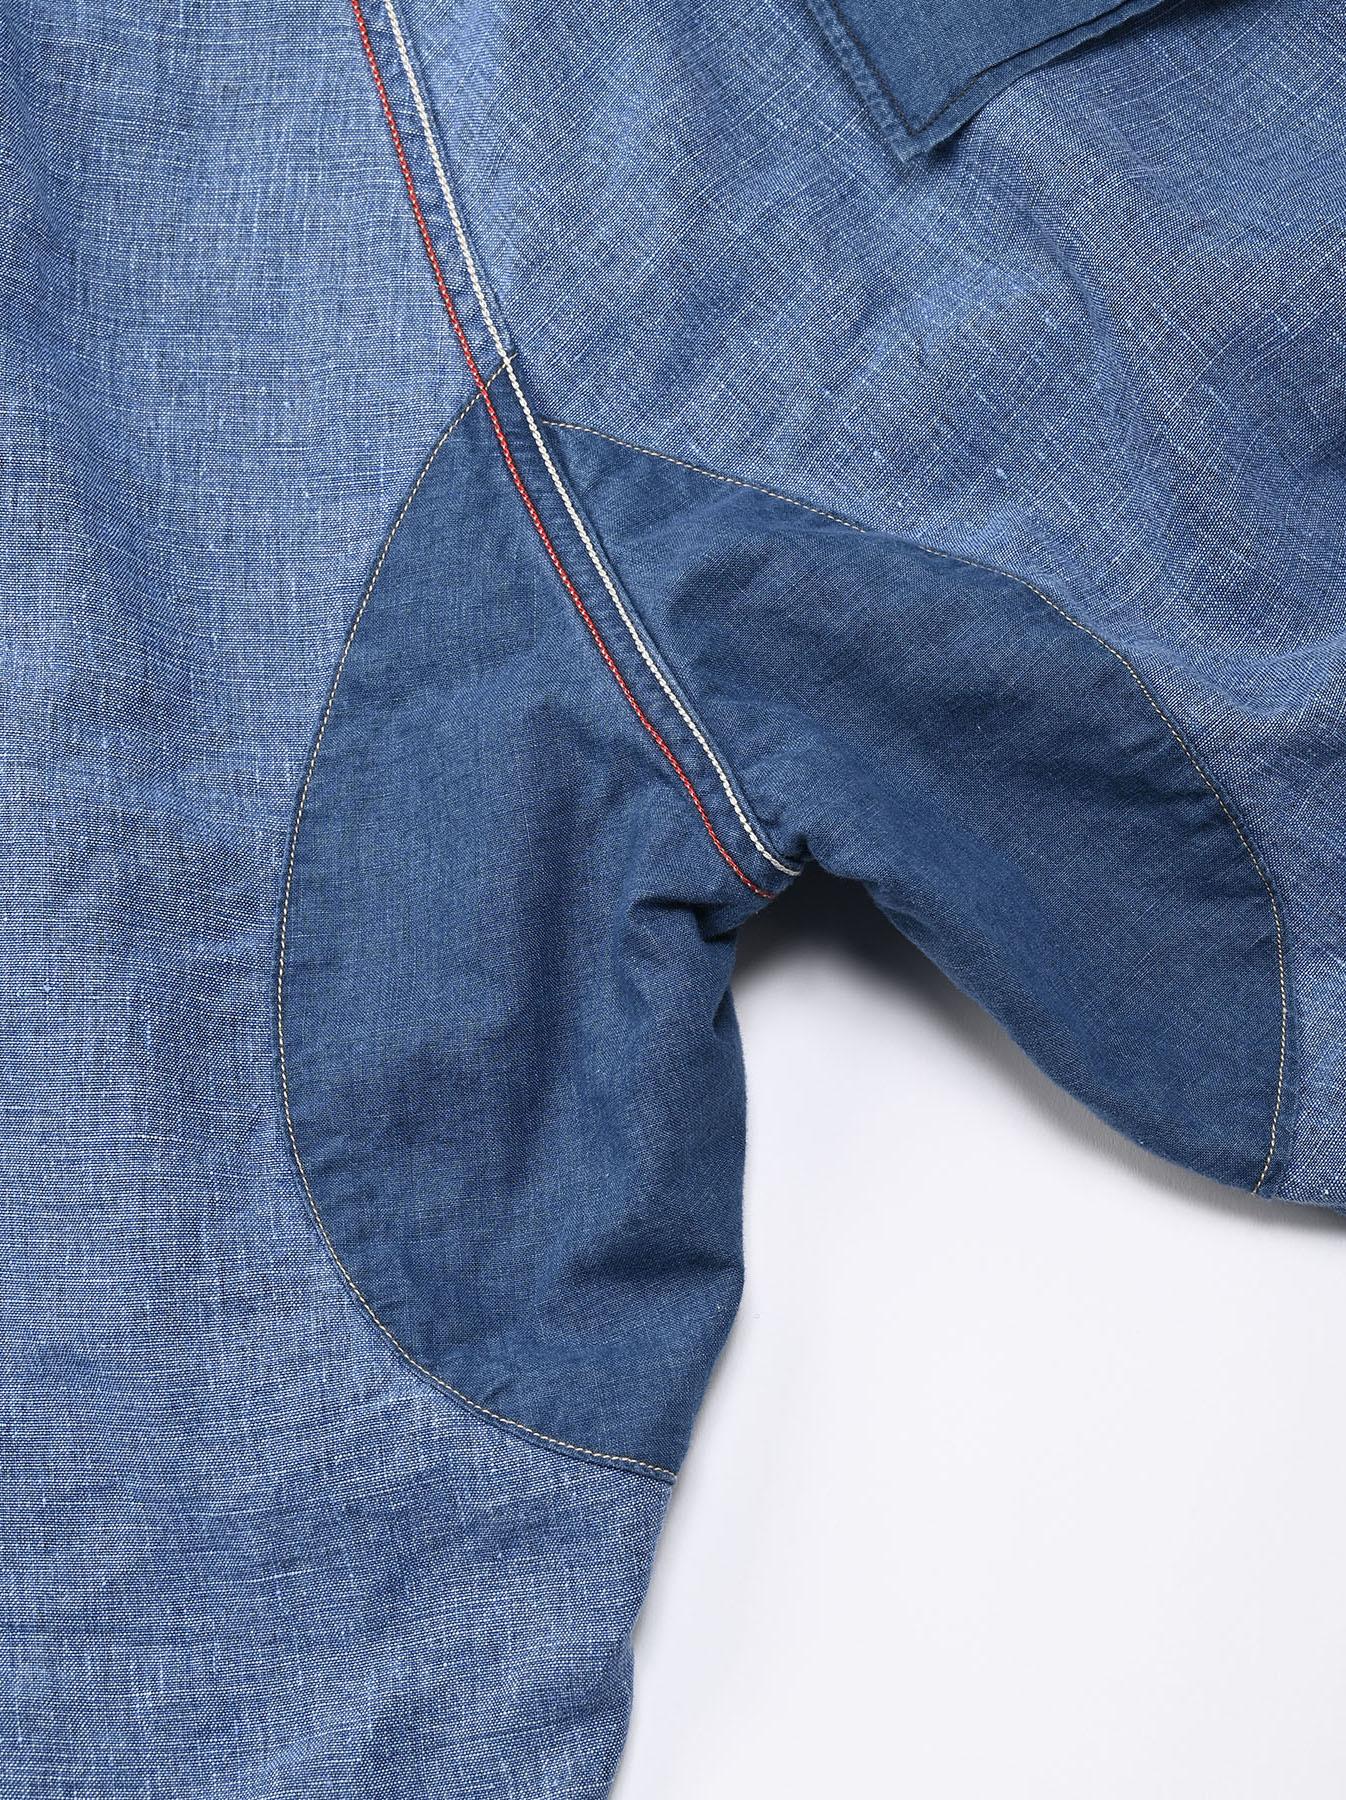 Indigo Linen 908 Easy Sail Pants Distressed (0721)-11